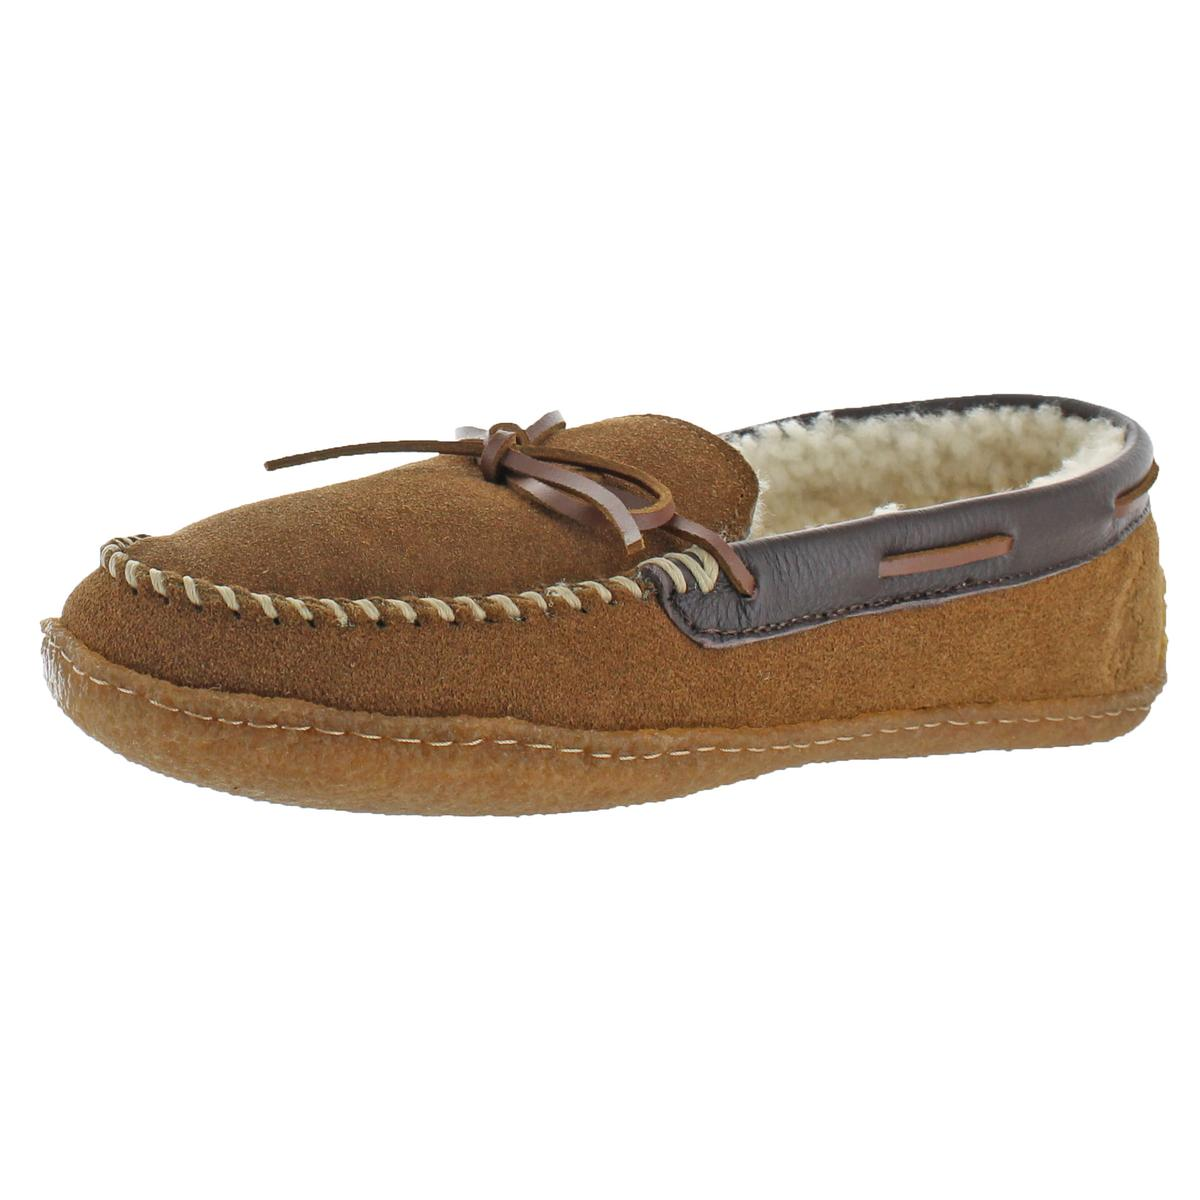 a27da1217 Details about Polo Ralph Lauren Mens Mason Moccasin Tan Moccasin Slippers 8  Medium (D) 7600